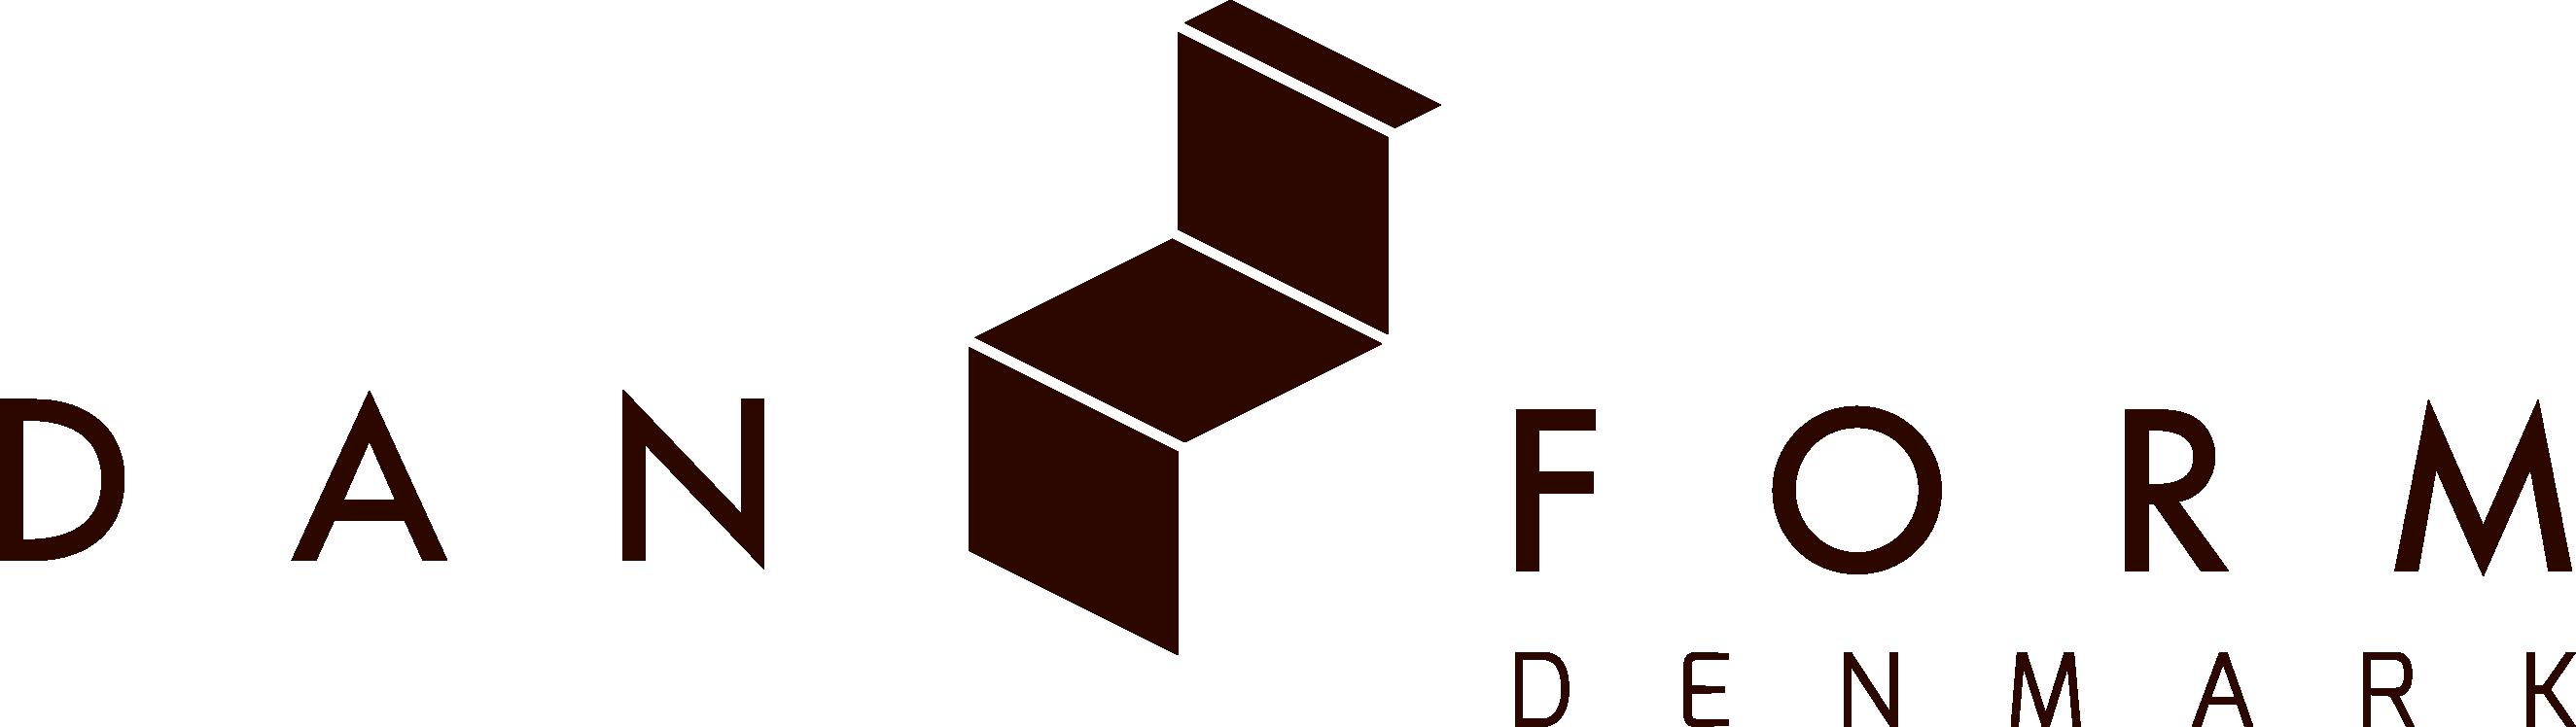 Dan-Form_logo_Denmark_Positiv